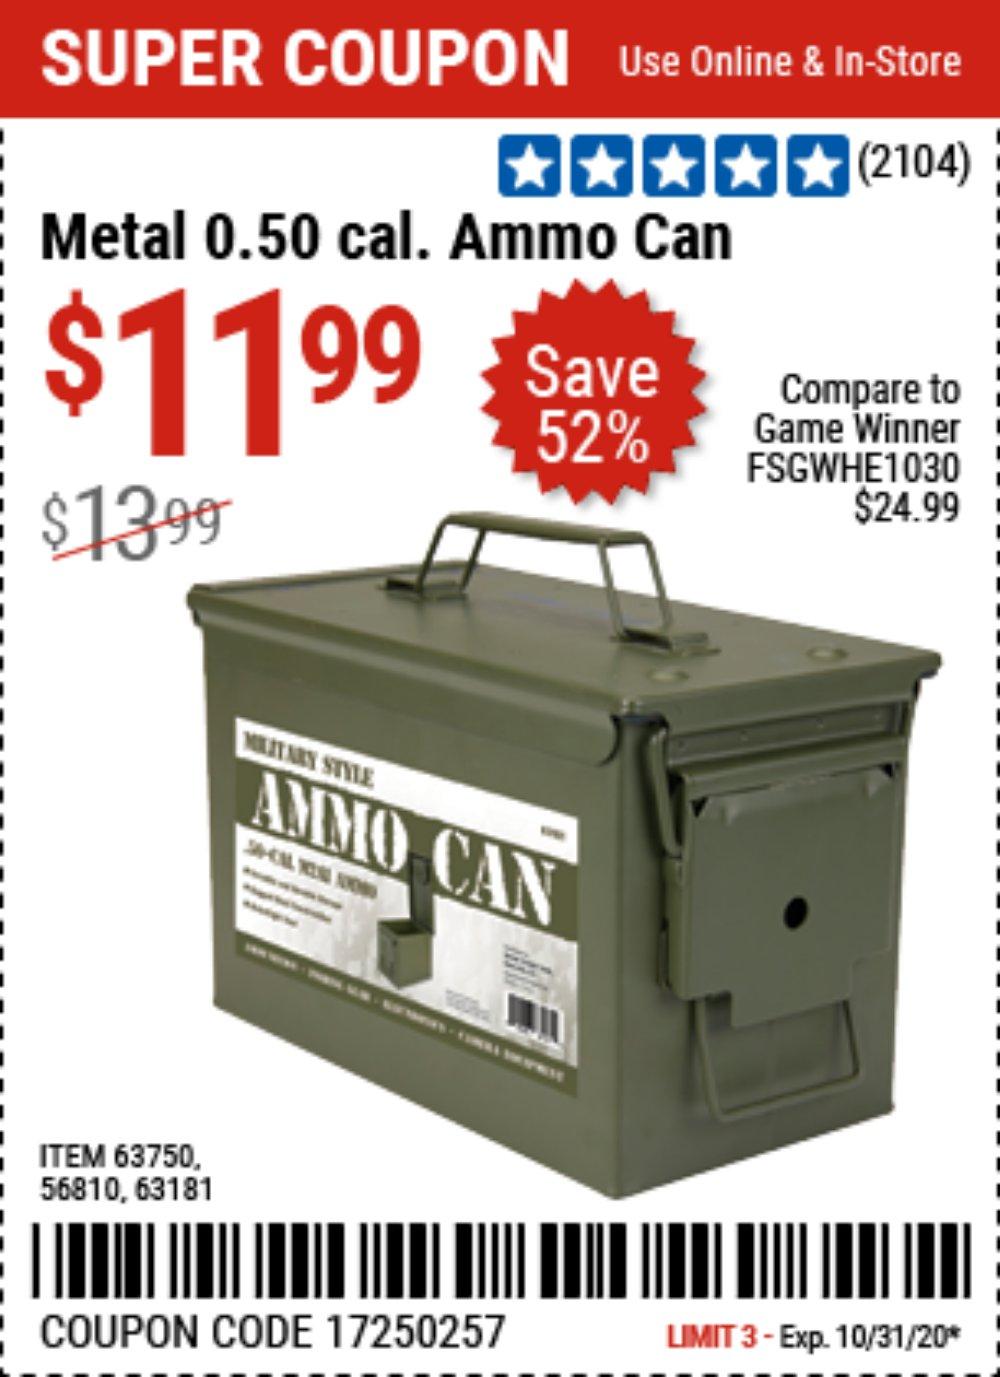 Harbor Freight Coupon, HF Coupons - .50 Cal Metal Ammo Can